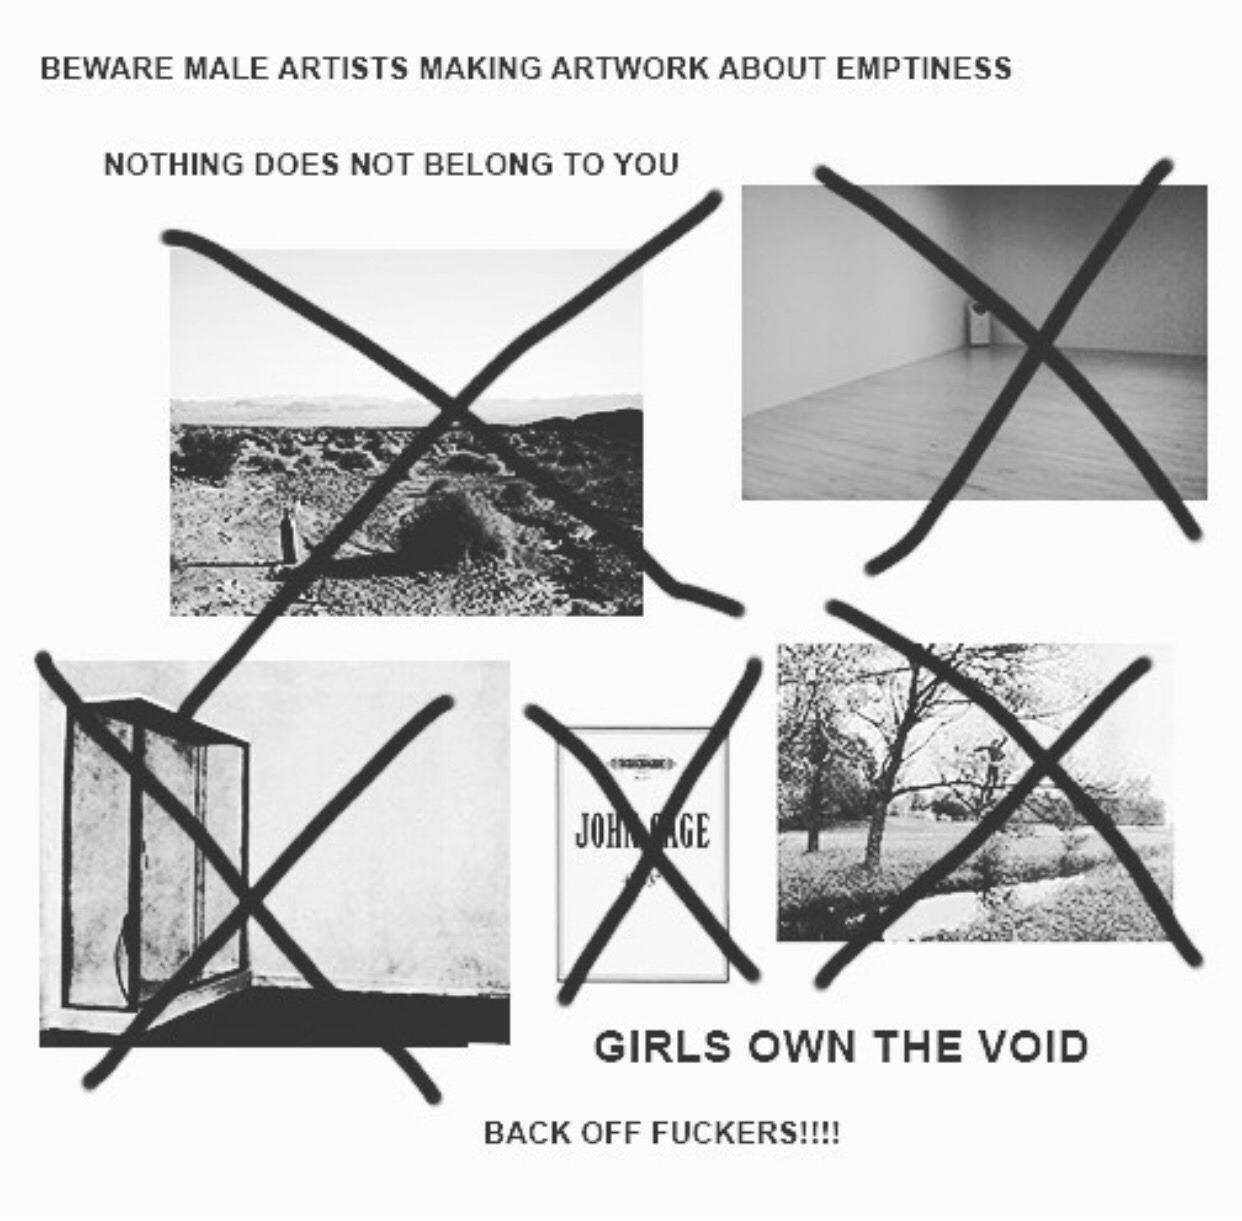 Kolaž sastavljen od 5 fotografija. Svaka je od njih prekrižena te im je pridodan natpis: BEWARE MALE ARTISTS MAKING ARTWORK ABOUT EMPTINESS/NOTHING DOES NOT BELONG TO YOU/GIRLS OWN THE VOID/ BACK OFF FUCKERS!!!!